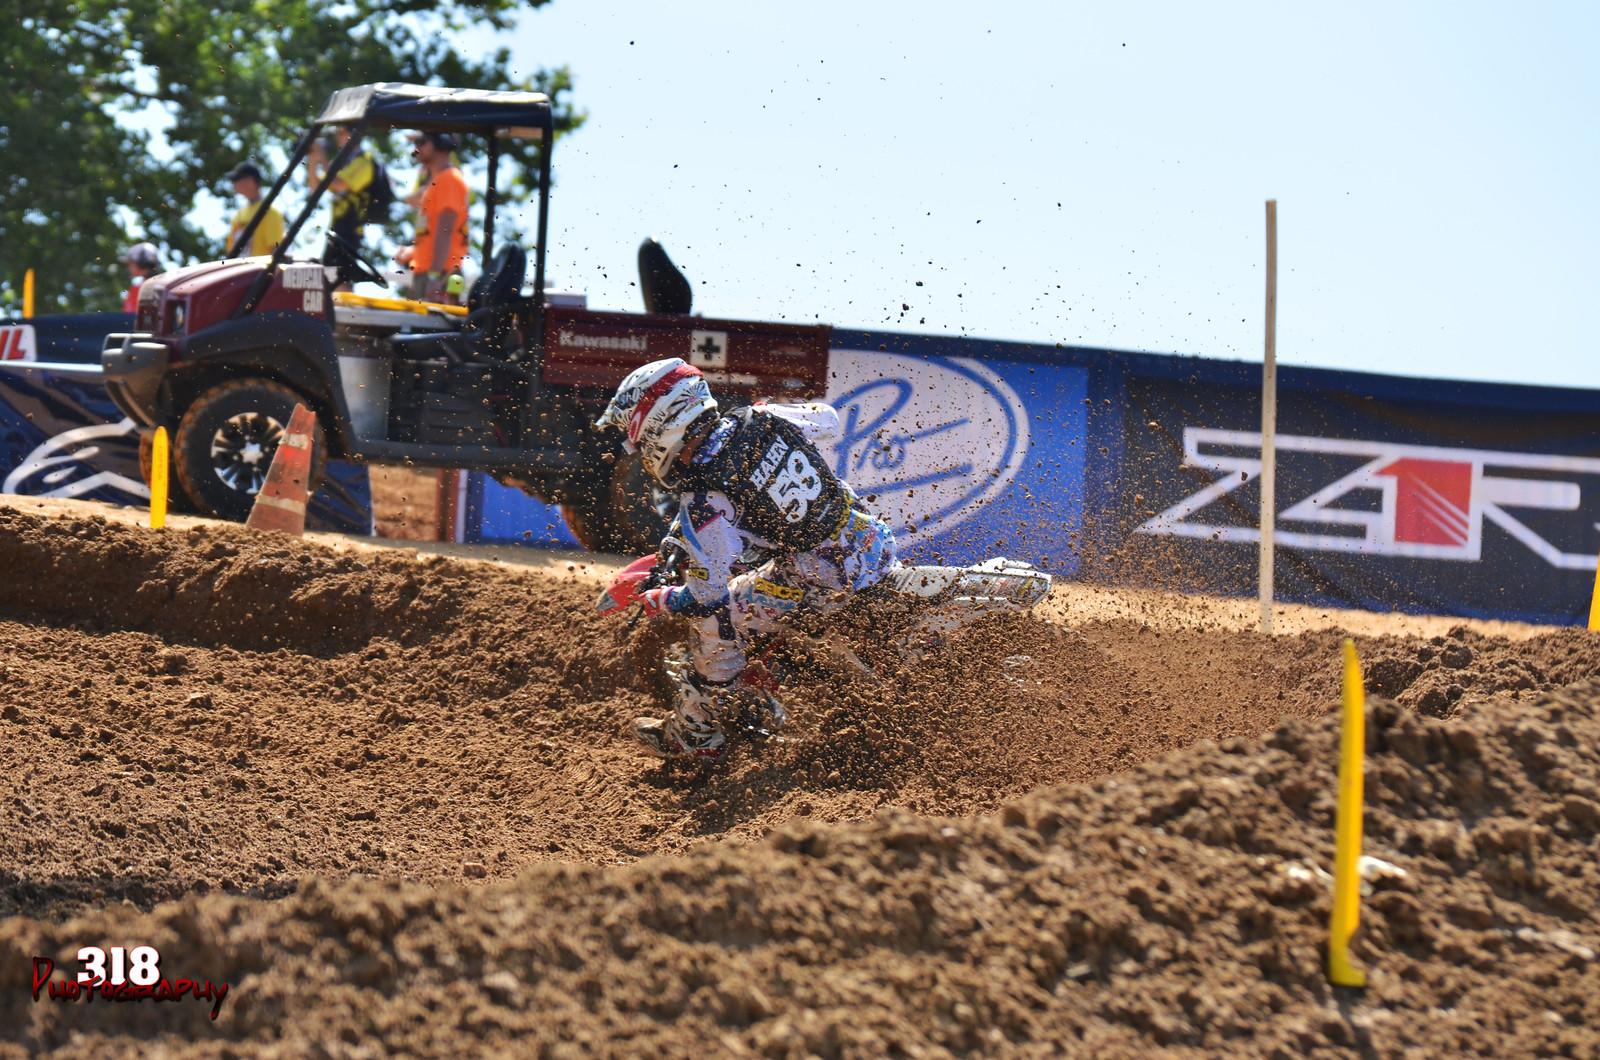 58-01 - MxPro318 - Motocross Pictures - Vital MX